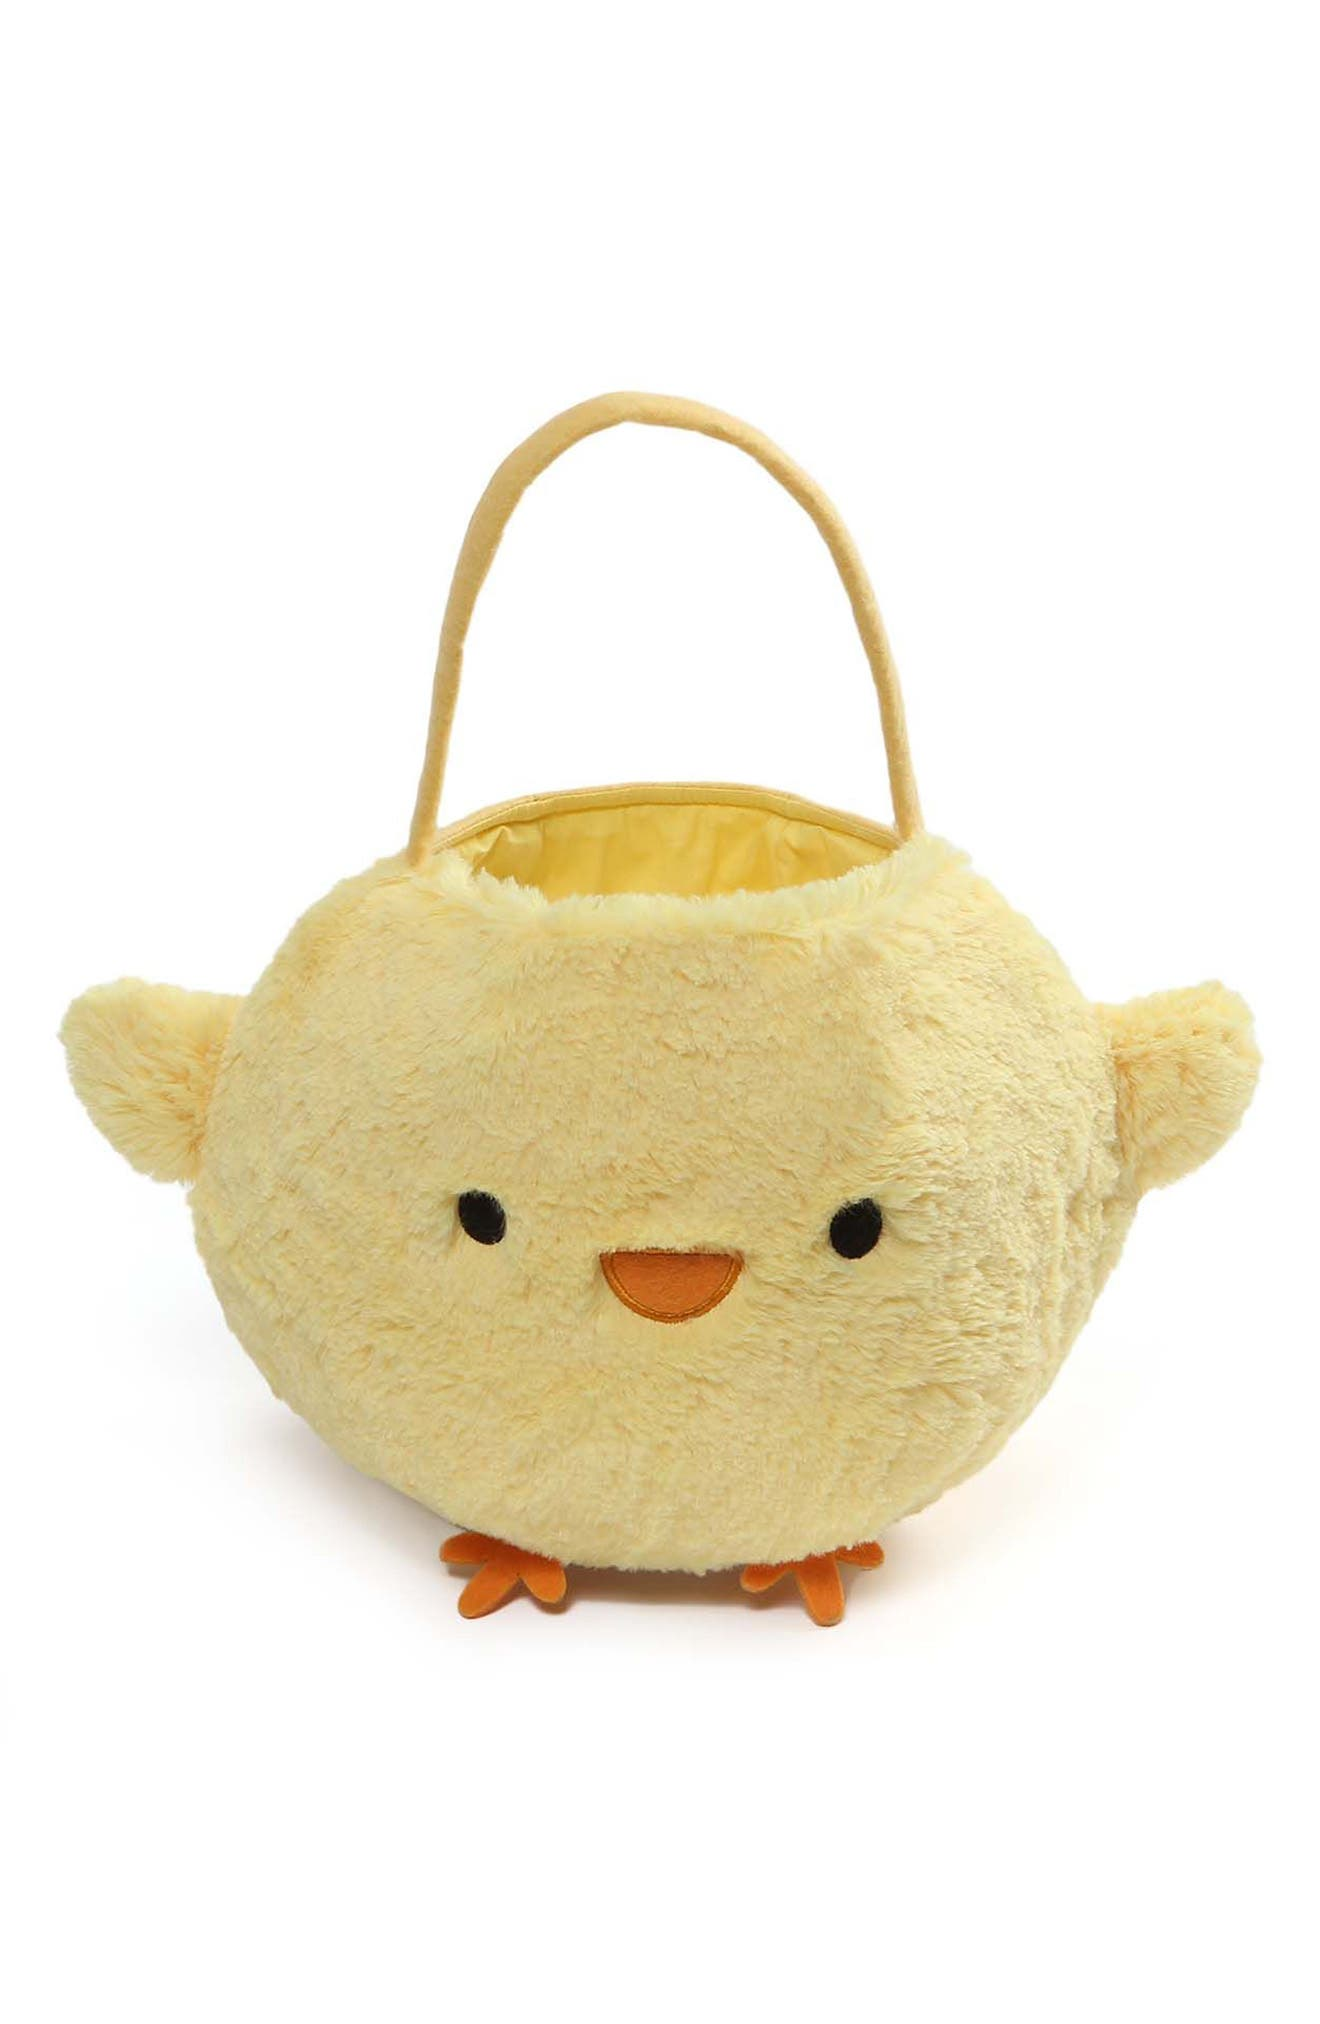 Baby Chick Plush Easter Basket,                             Main thumbnail 1, color,                             700